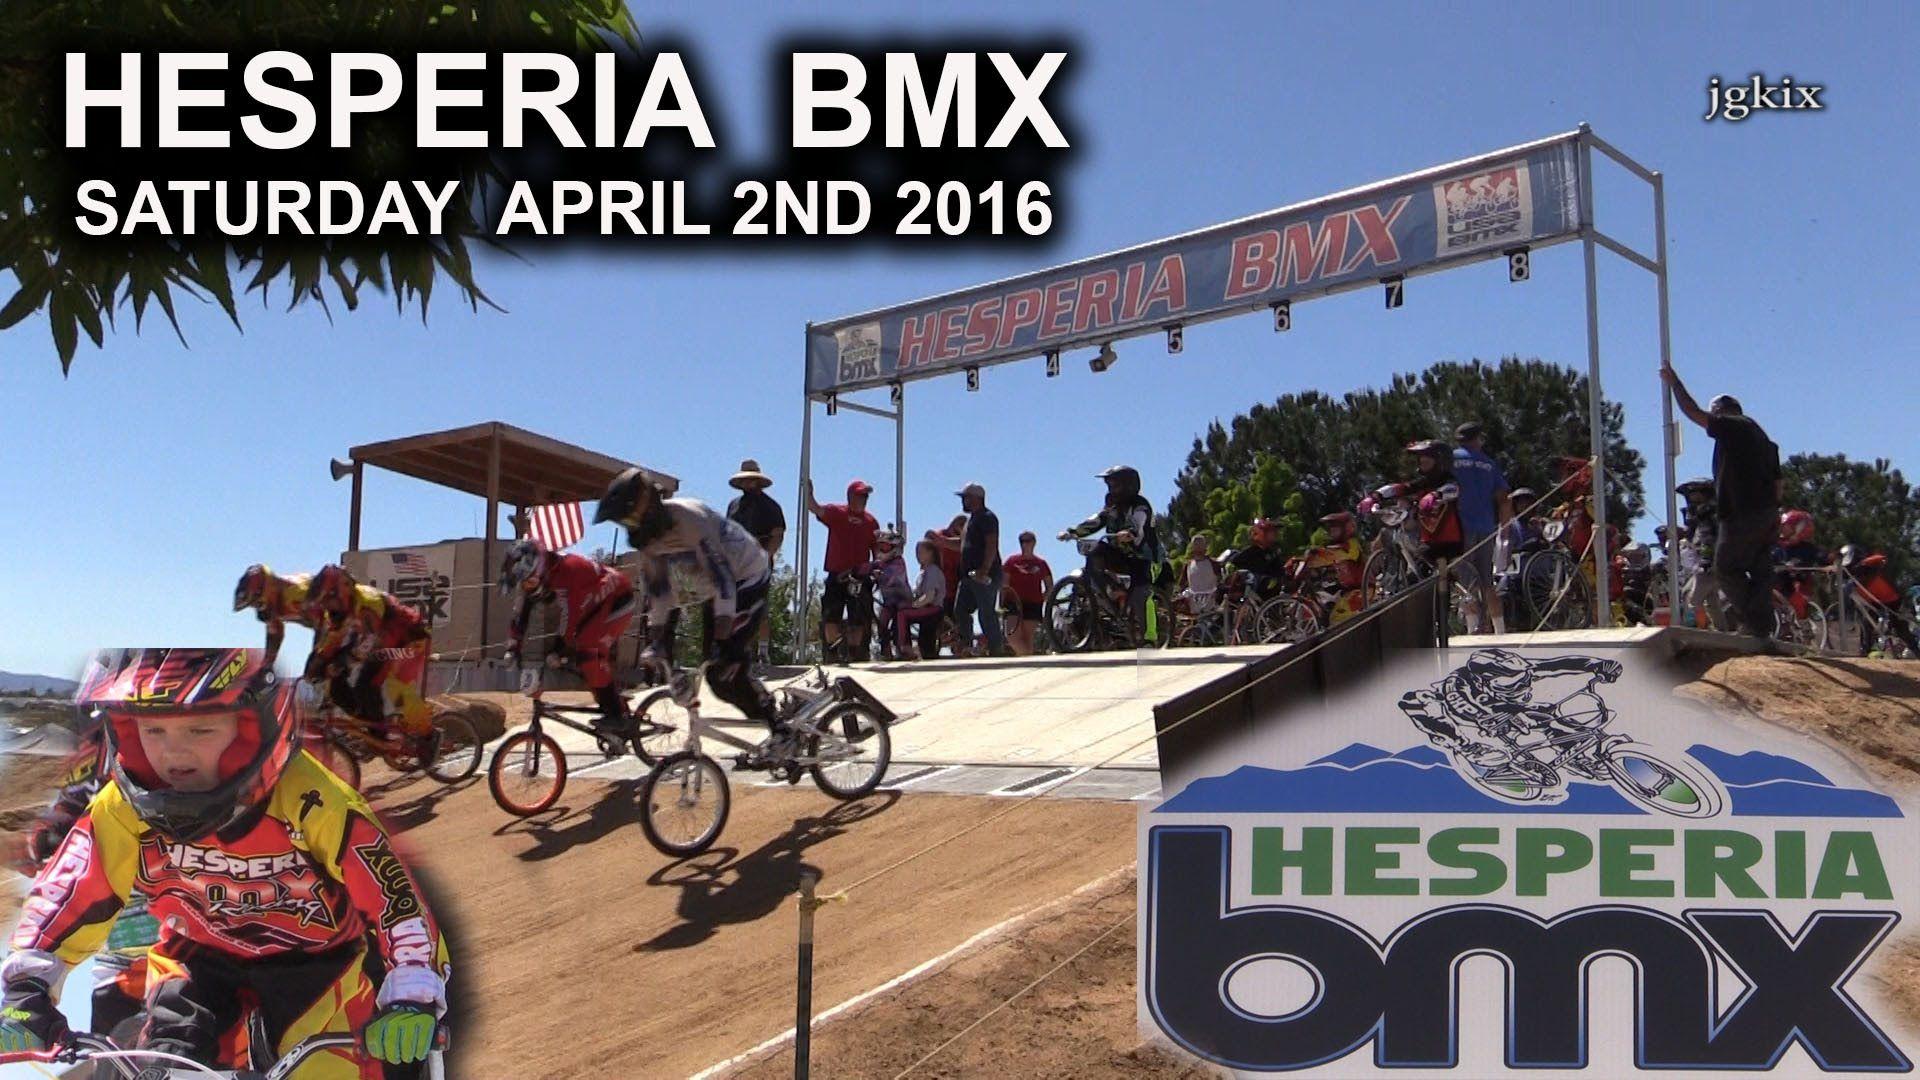 Hesperia BMX April 2nd 2016